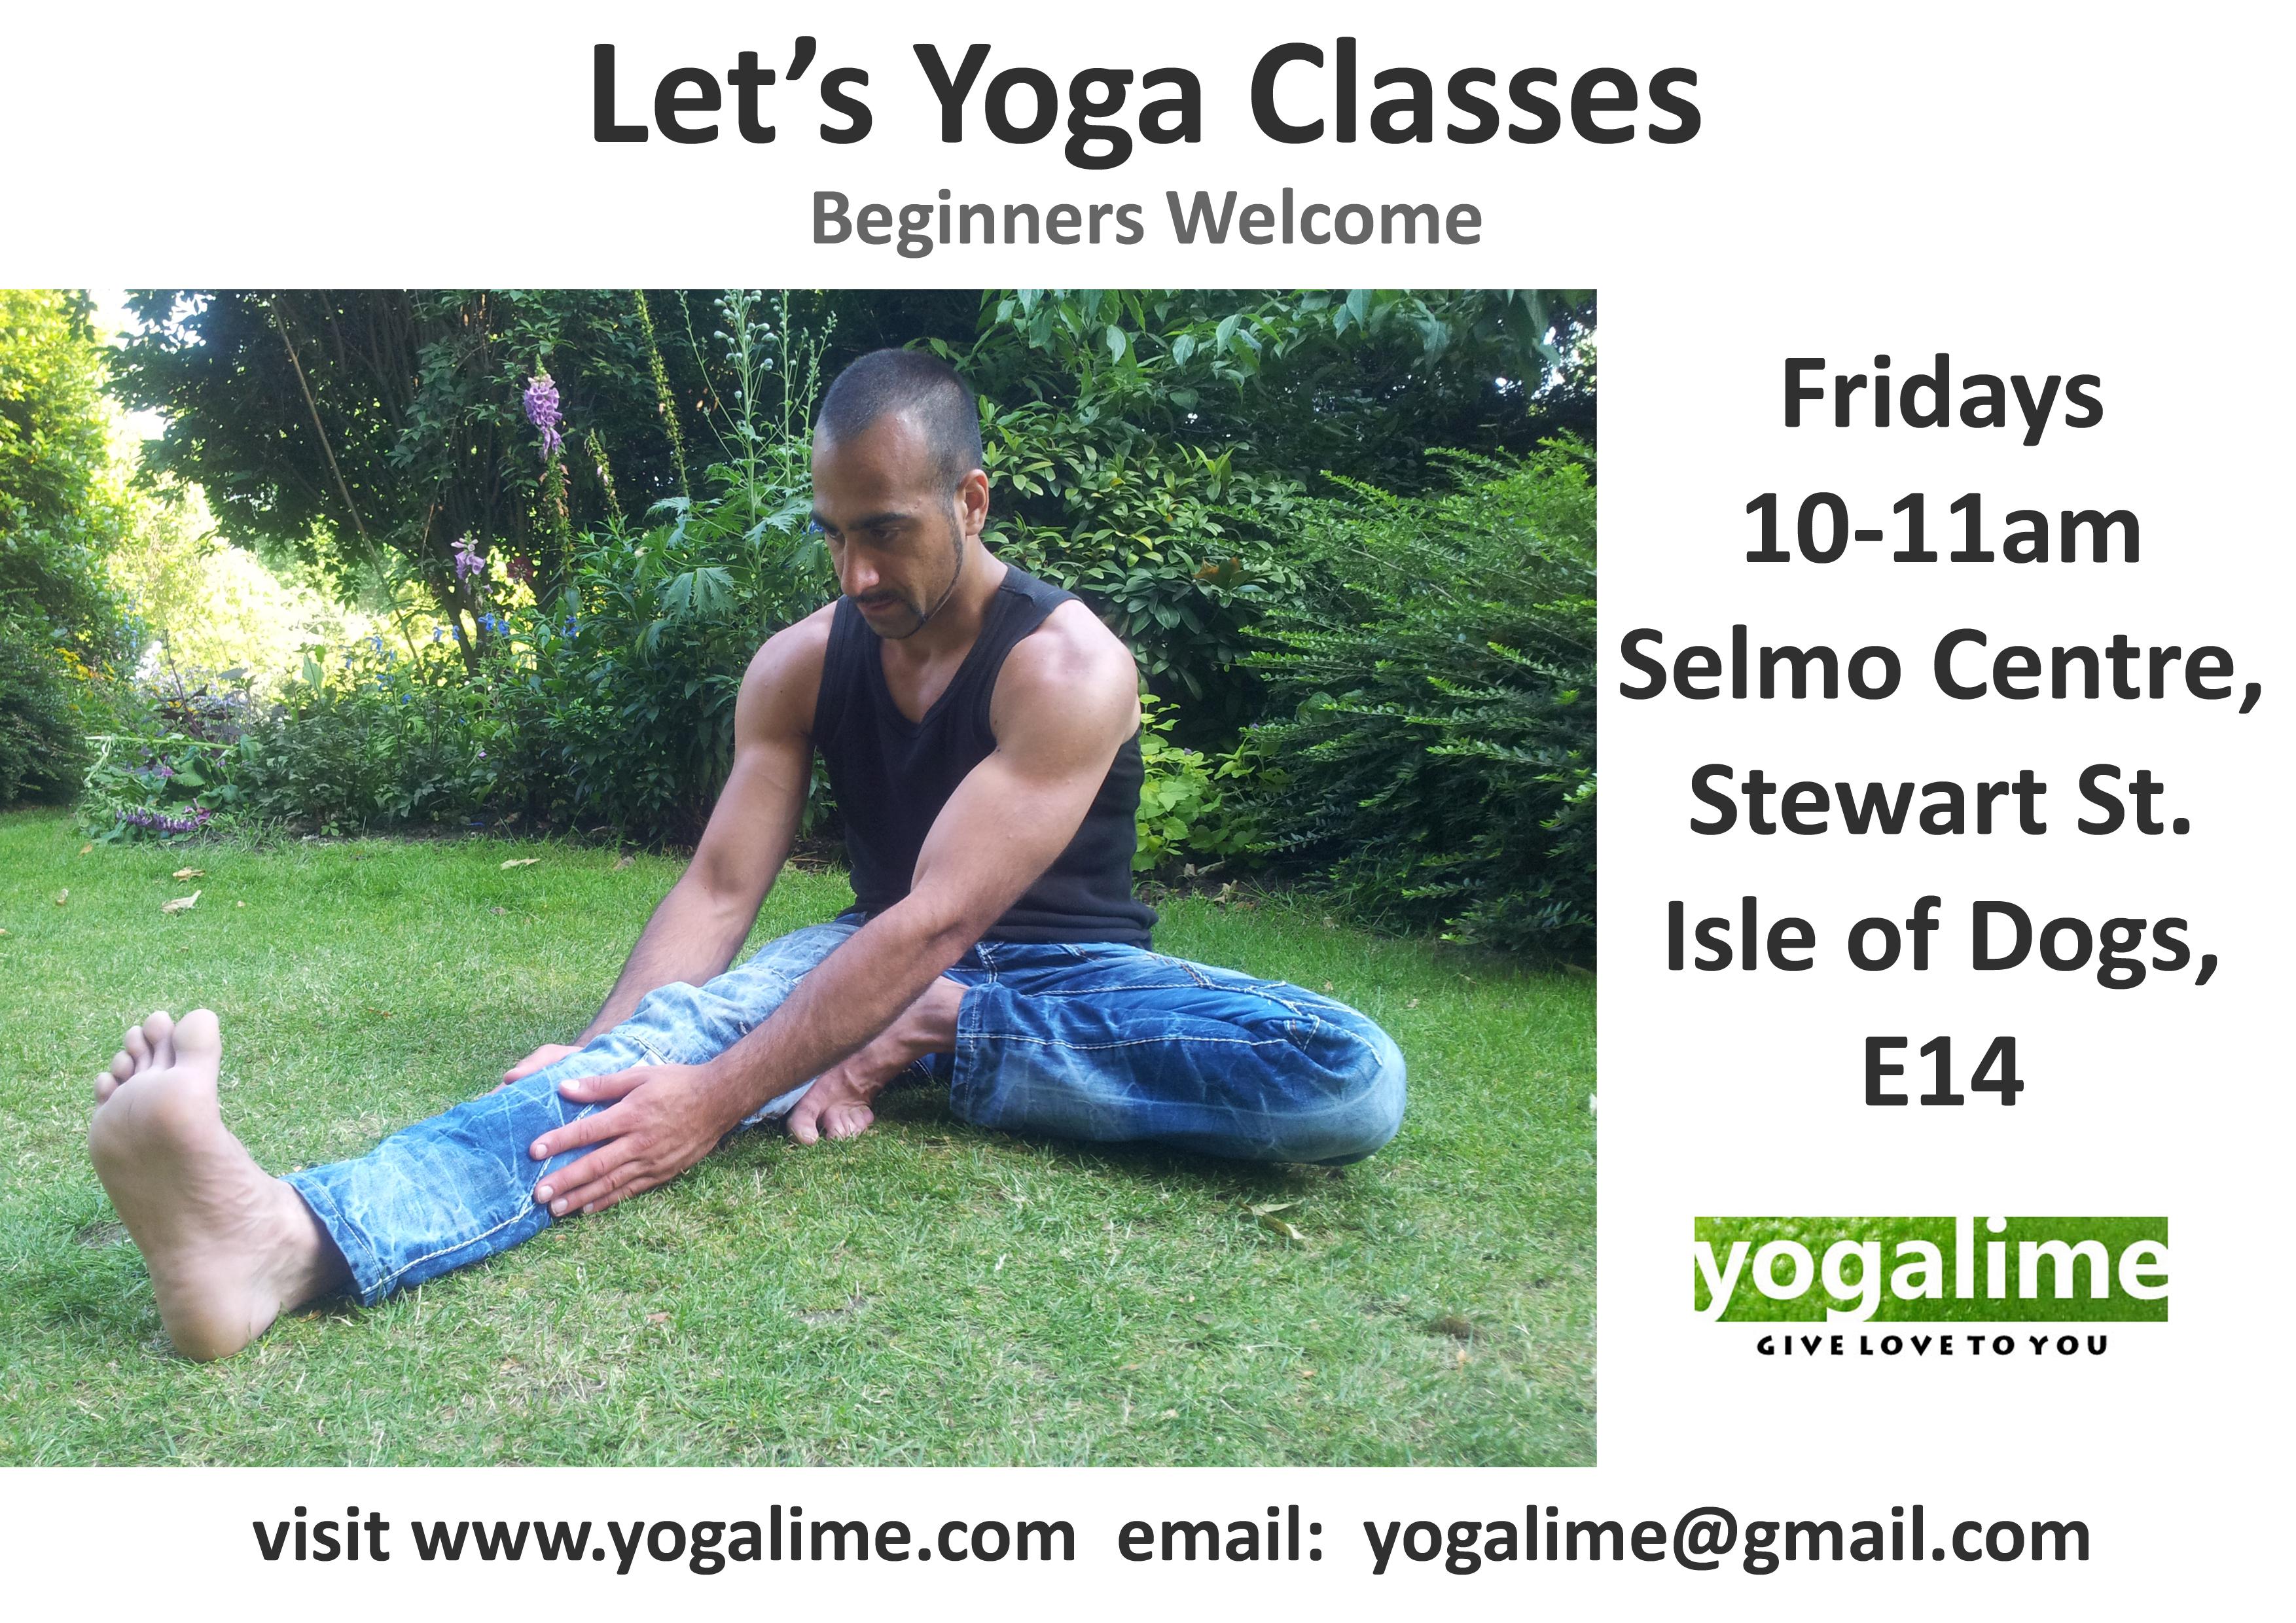 yoga class in E14, Selmo Centre, Isle of Dogs, yogalime